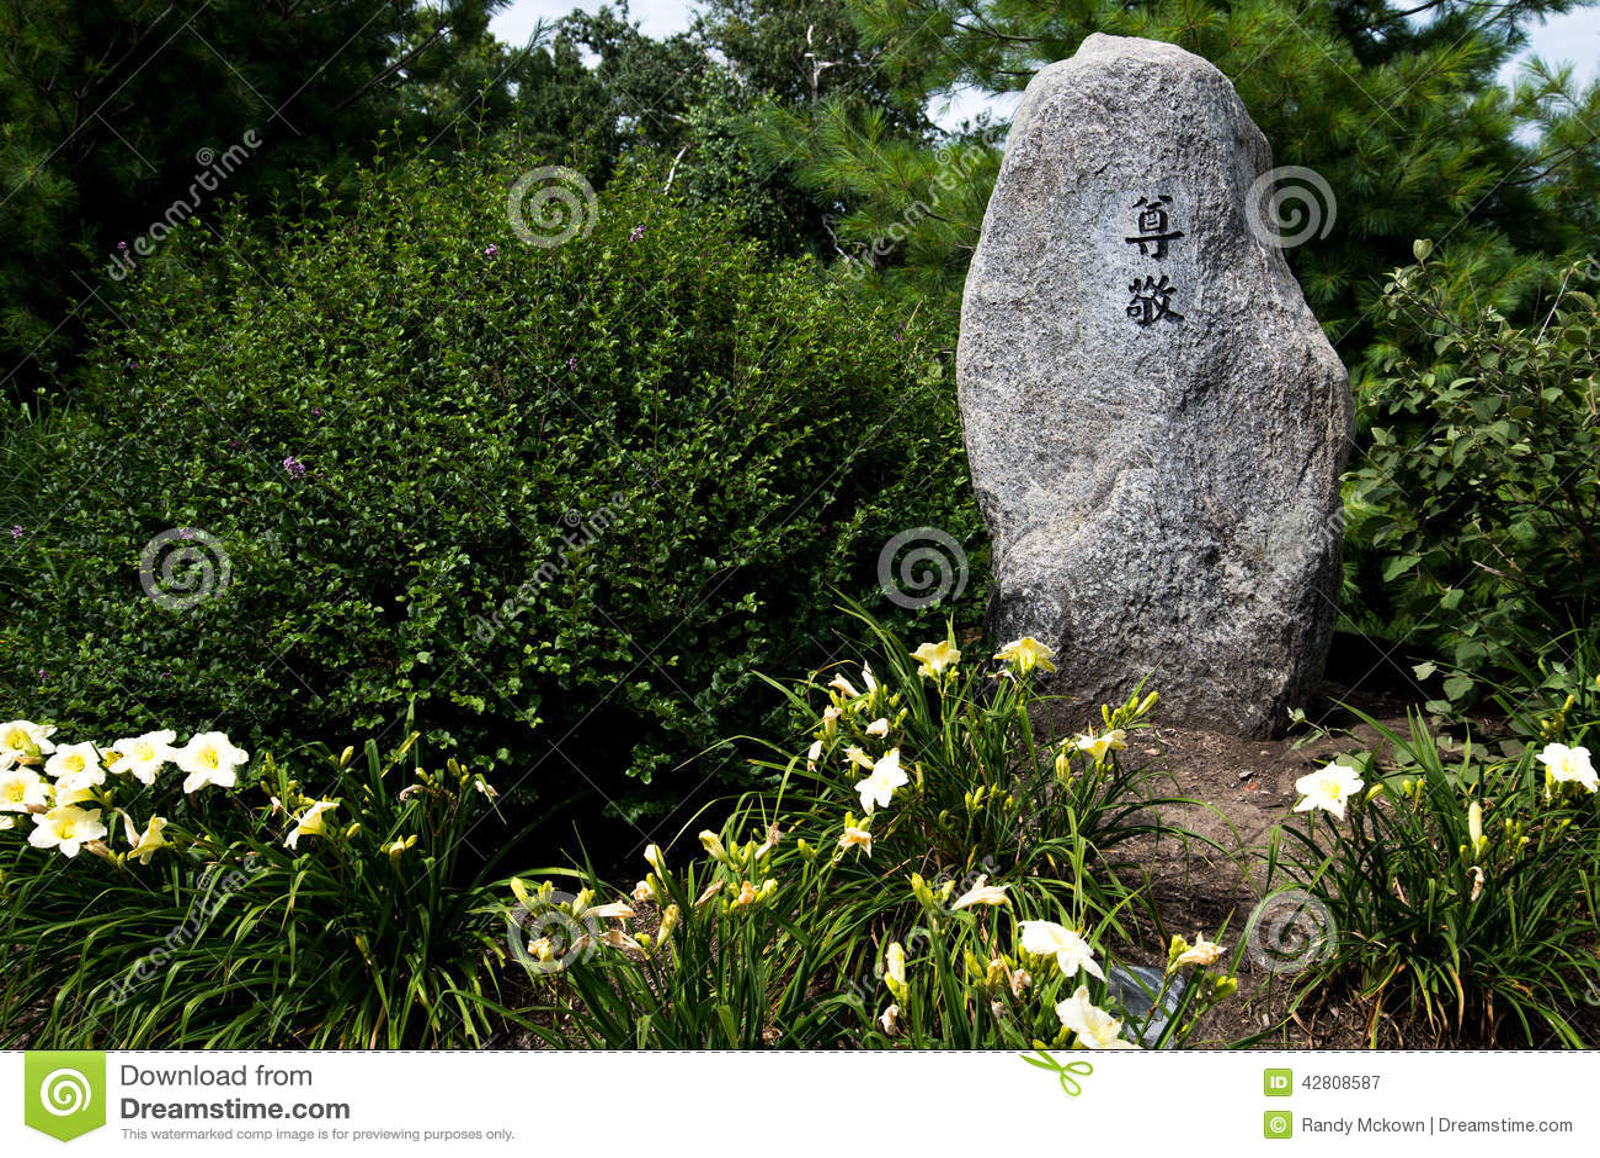 Japanese rock garden stock photo image 42808587 for Landscaping rocks des moines